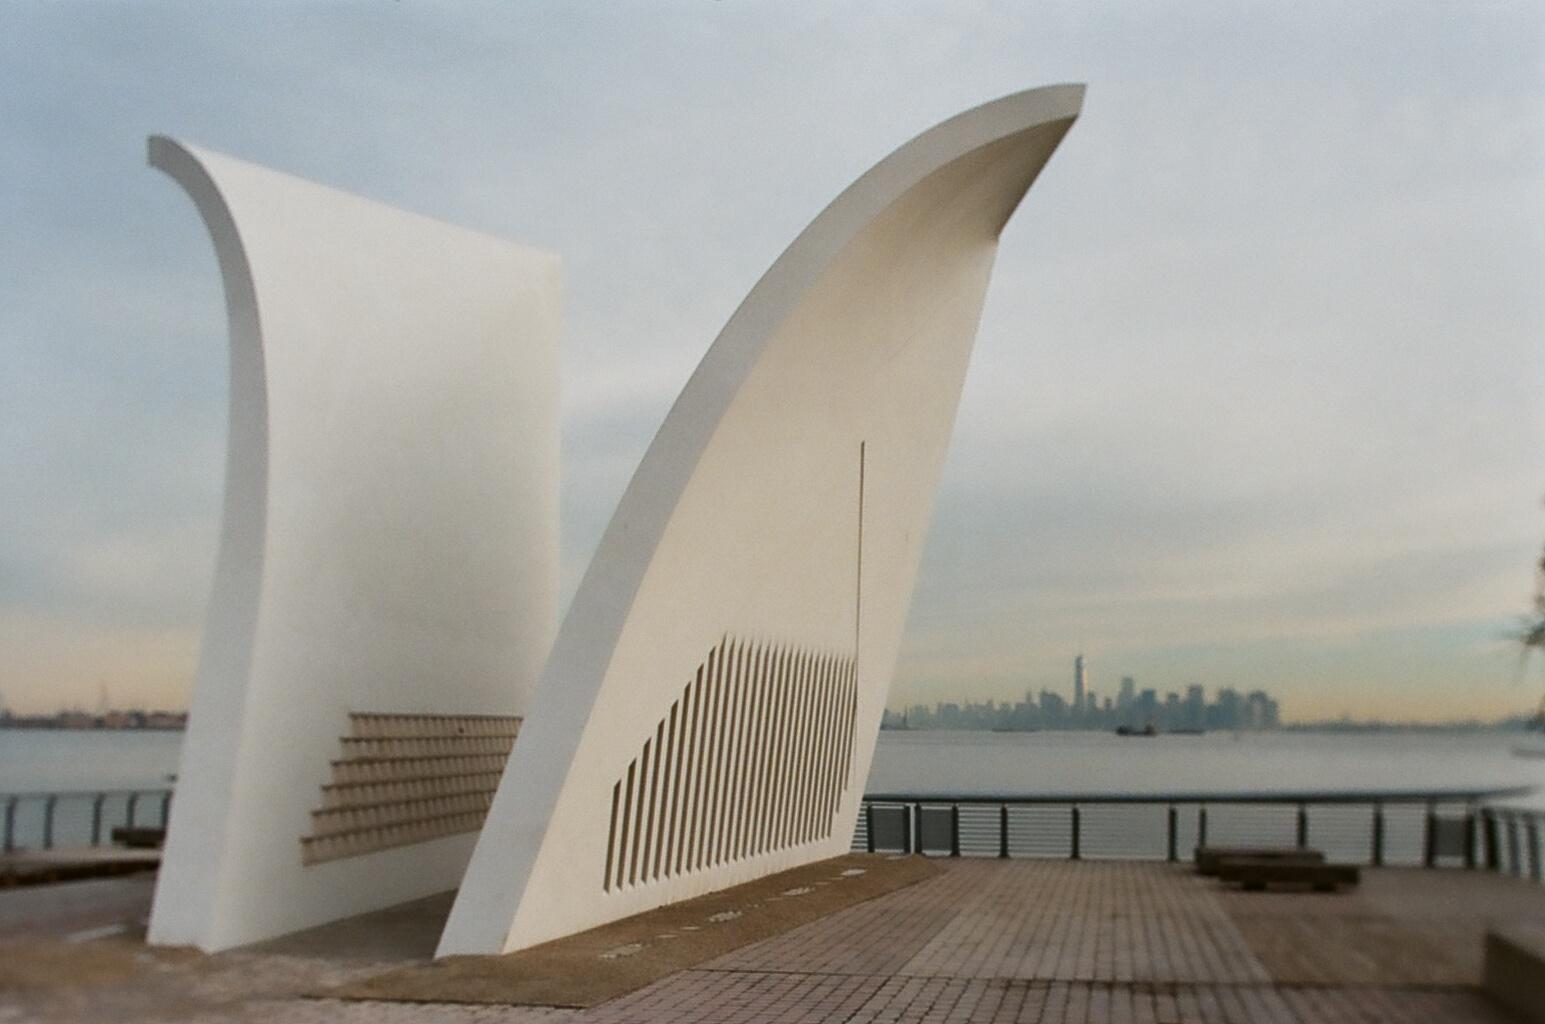 Going Analog, Full 35mm Photography Kit, Staten Island 9/11 Memorial